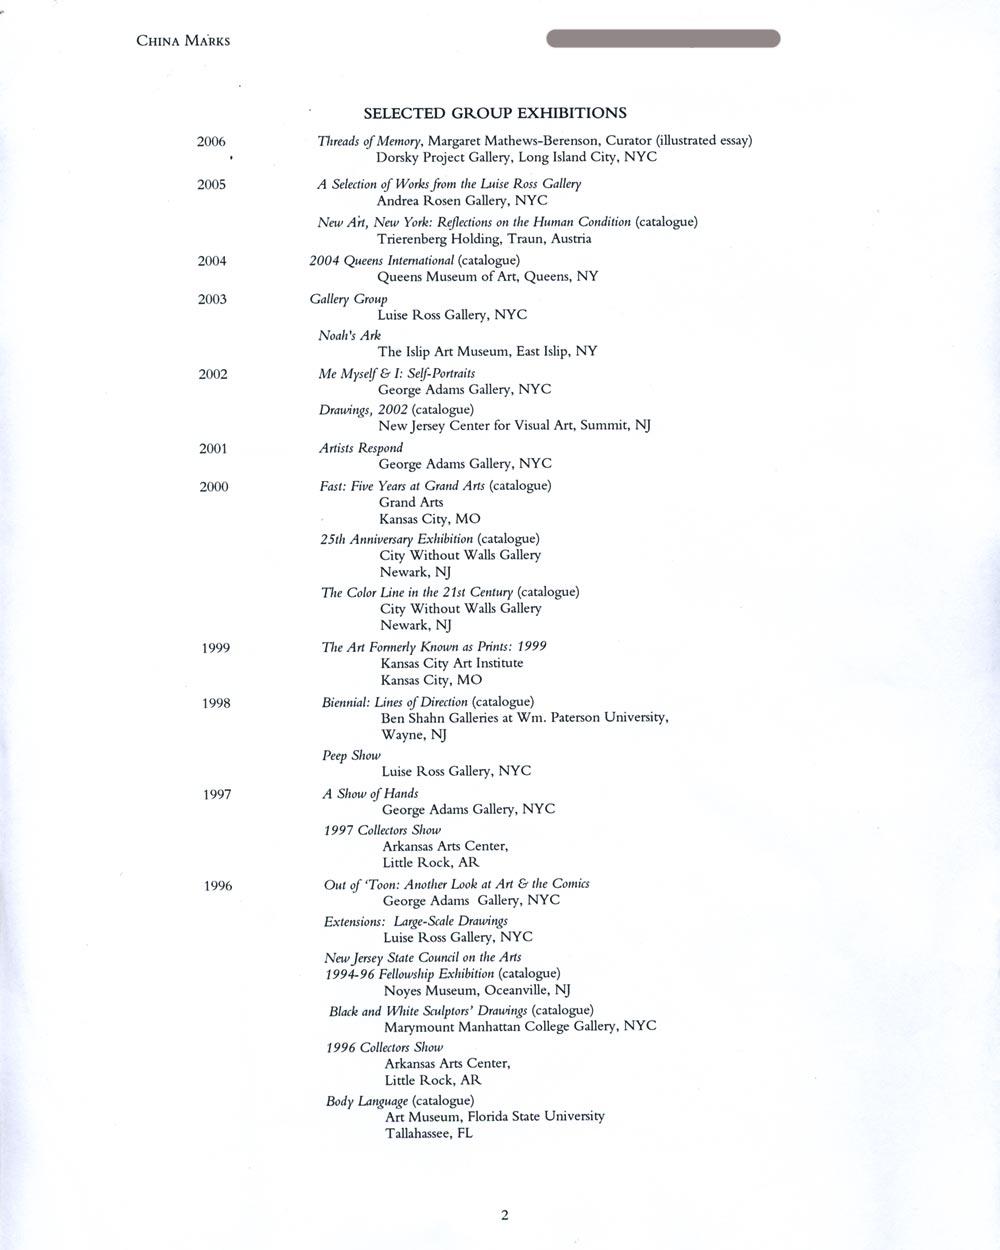 China Mark's Resume, pg 2